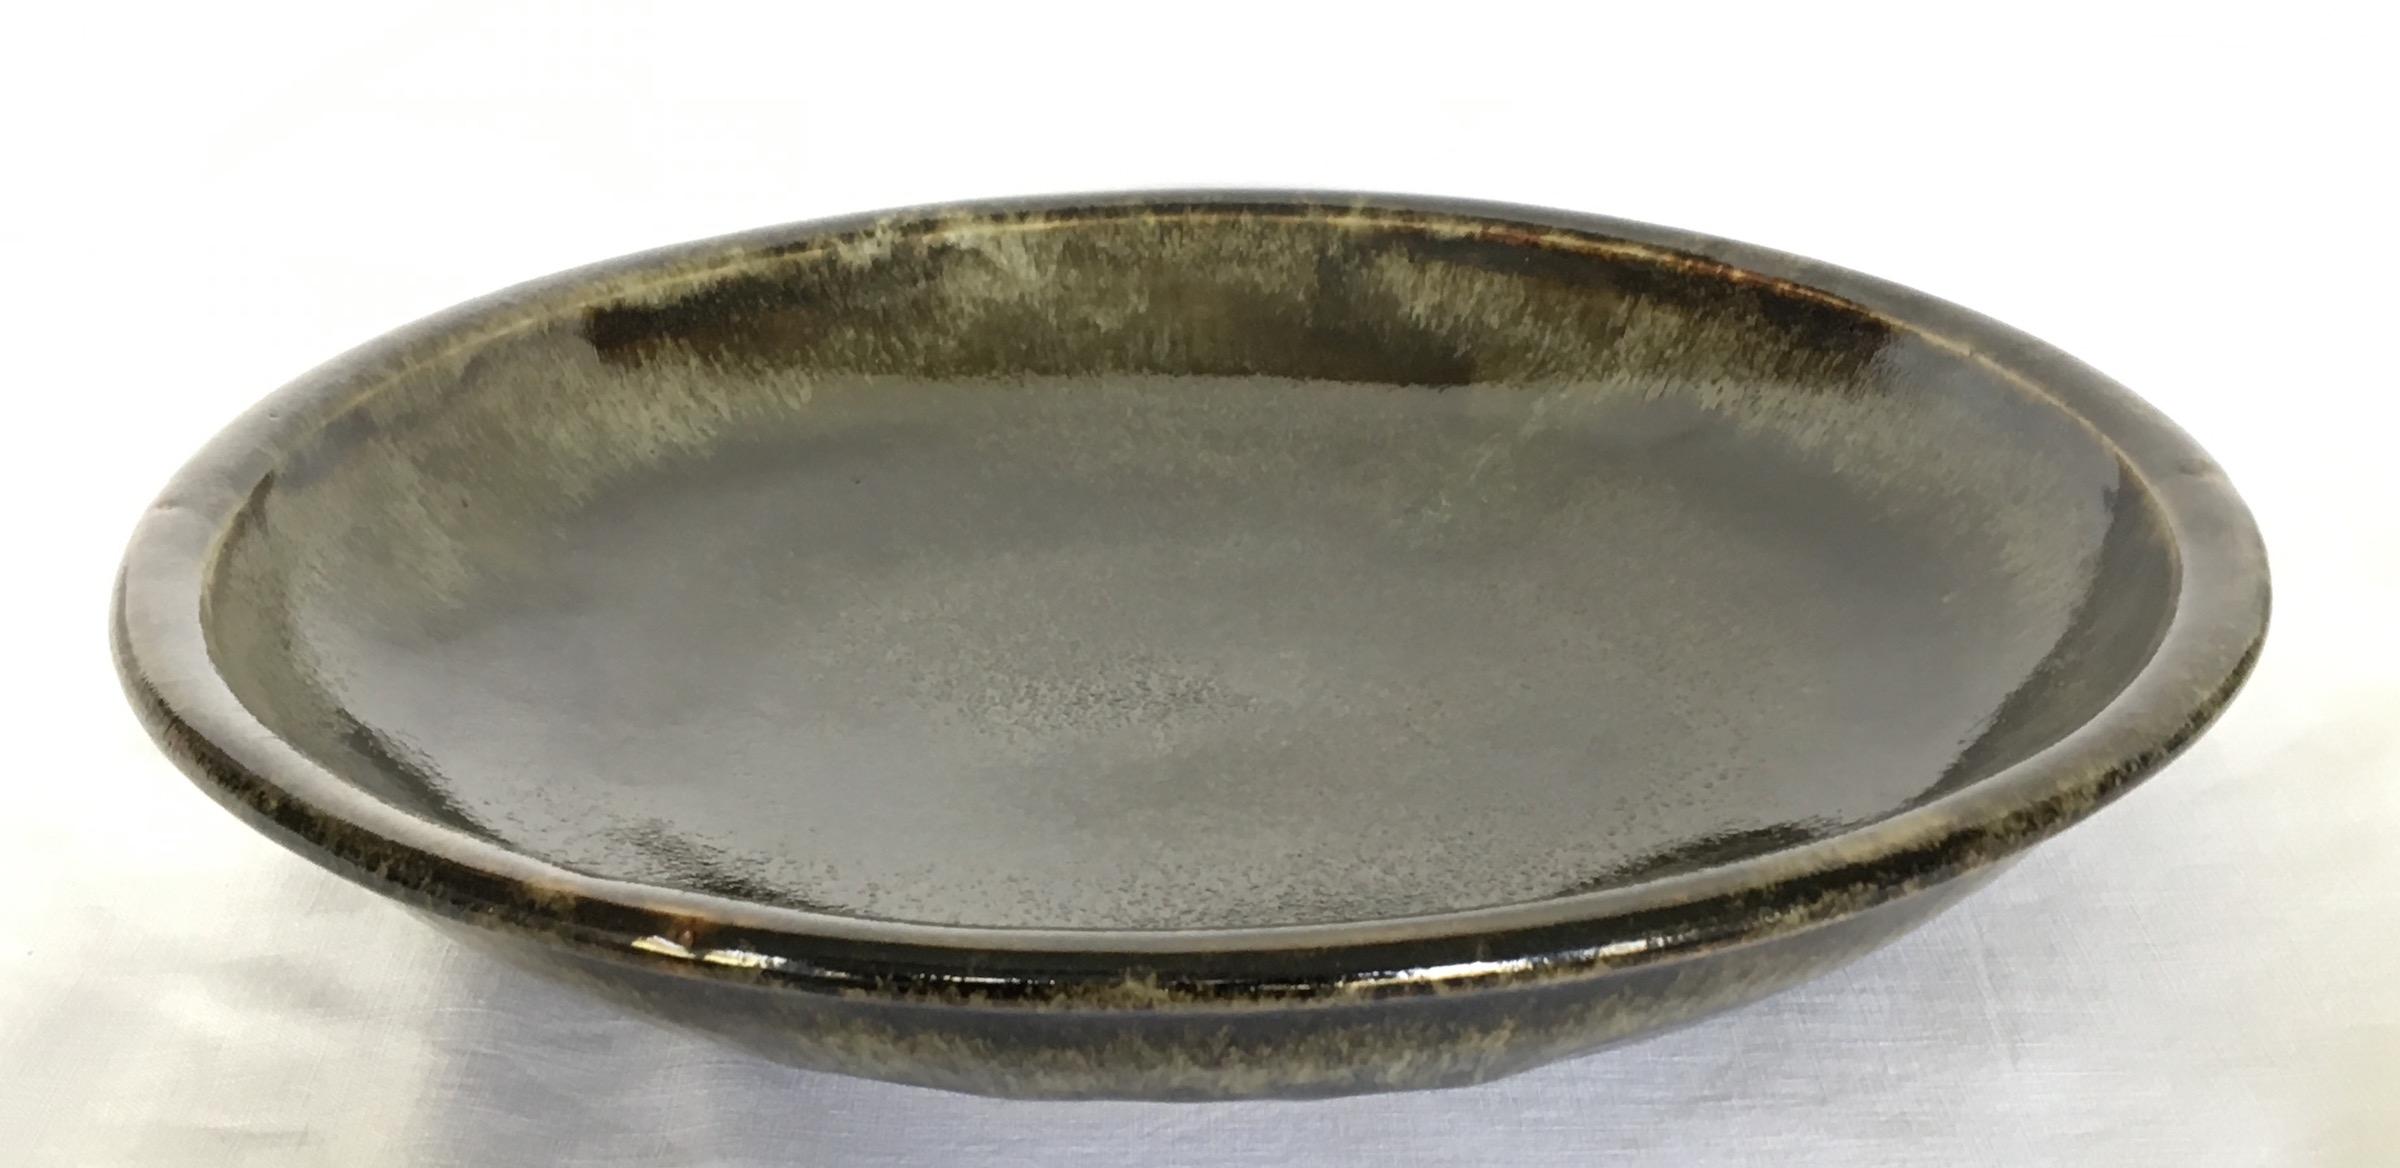 shallow dish willtemjpg